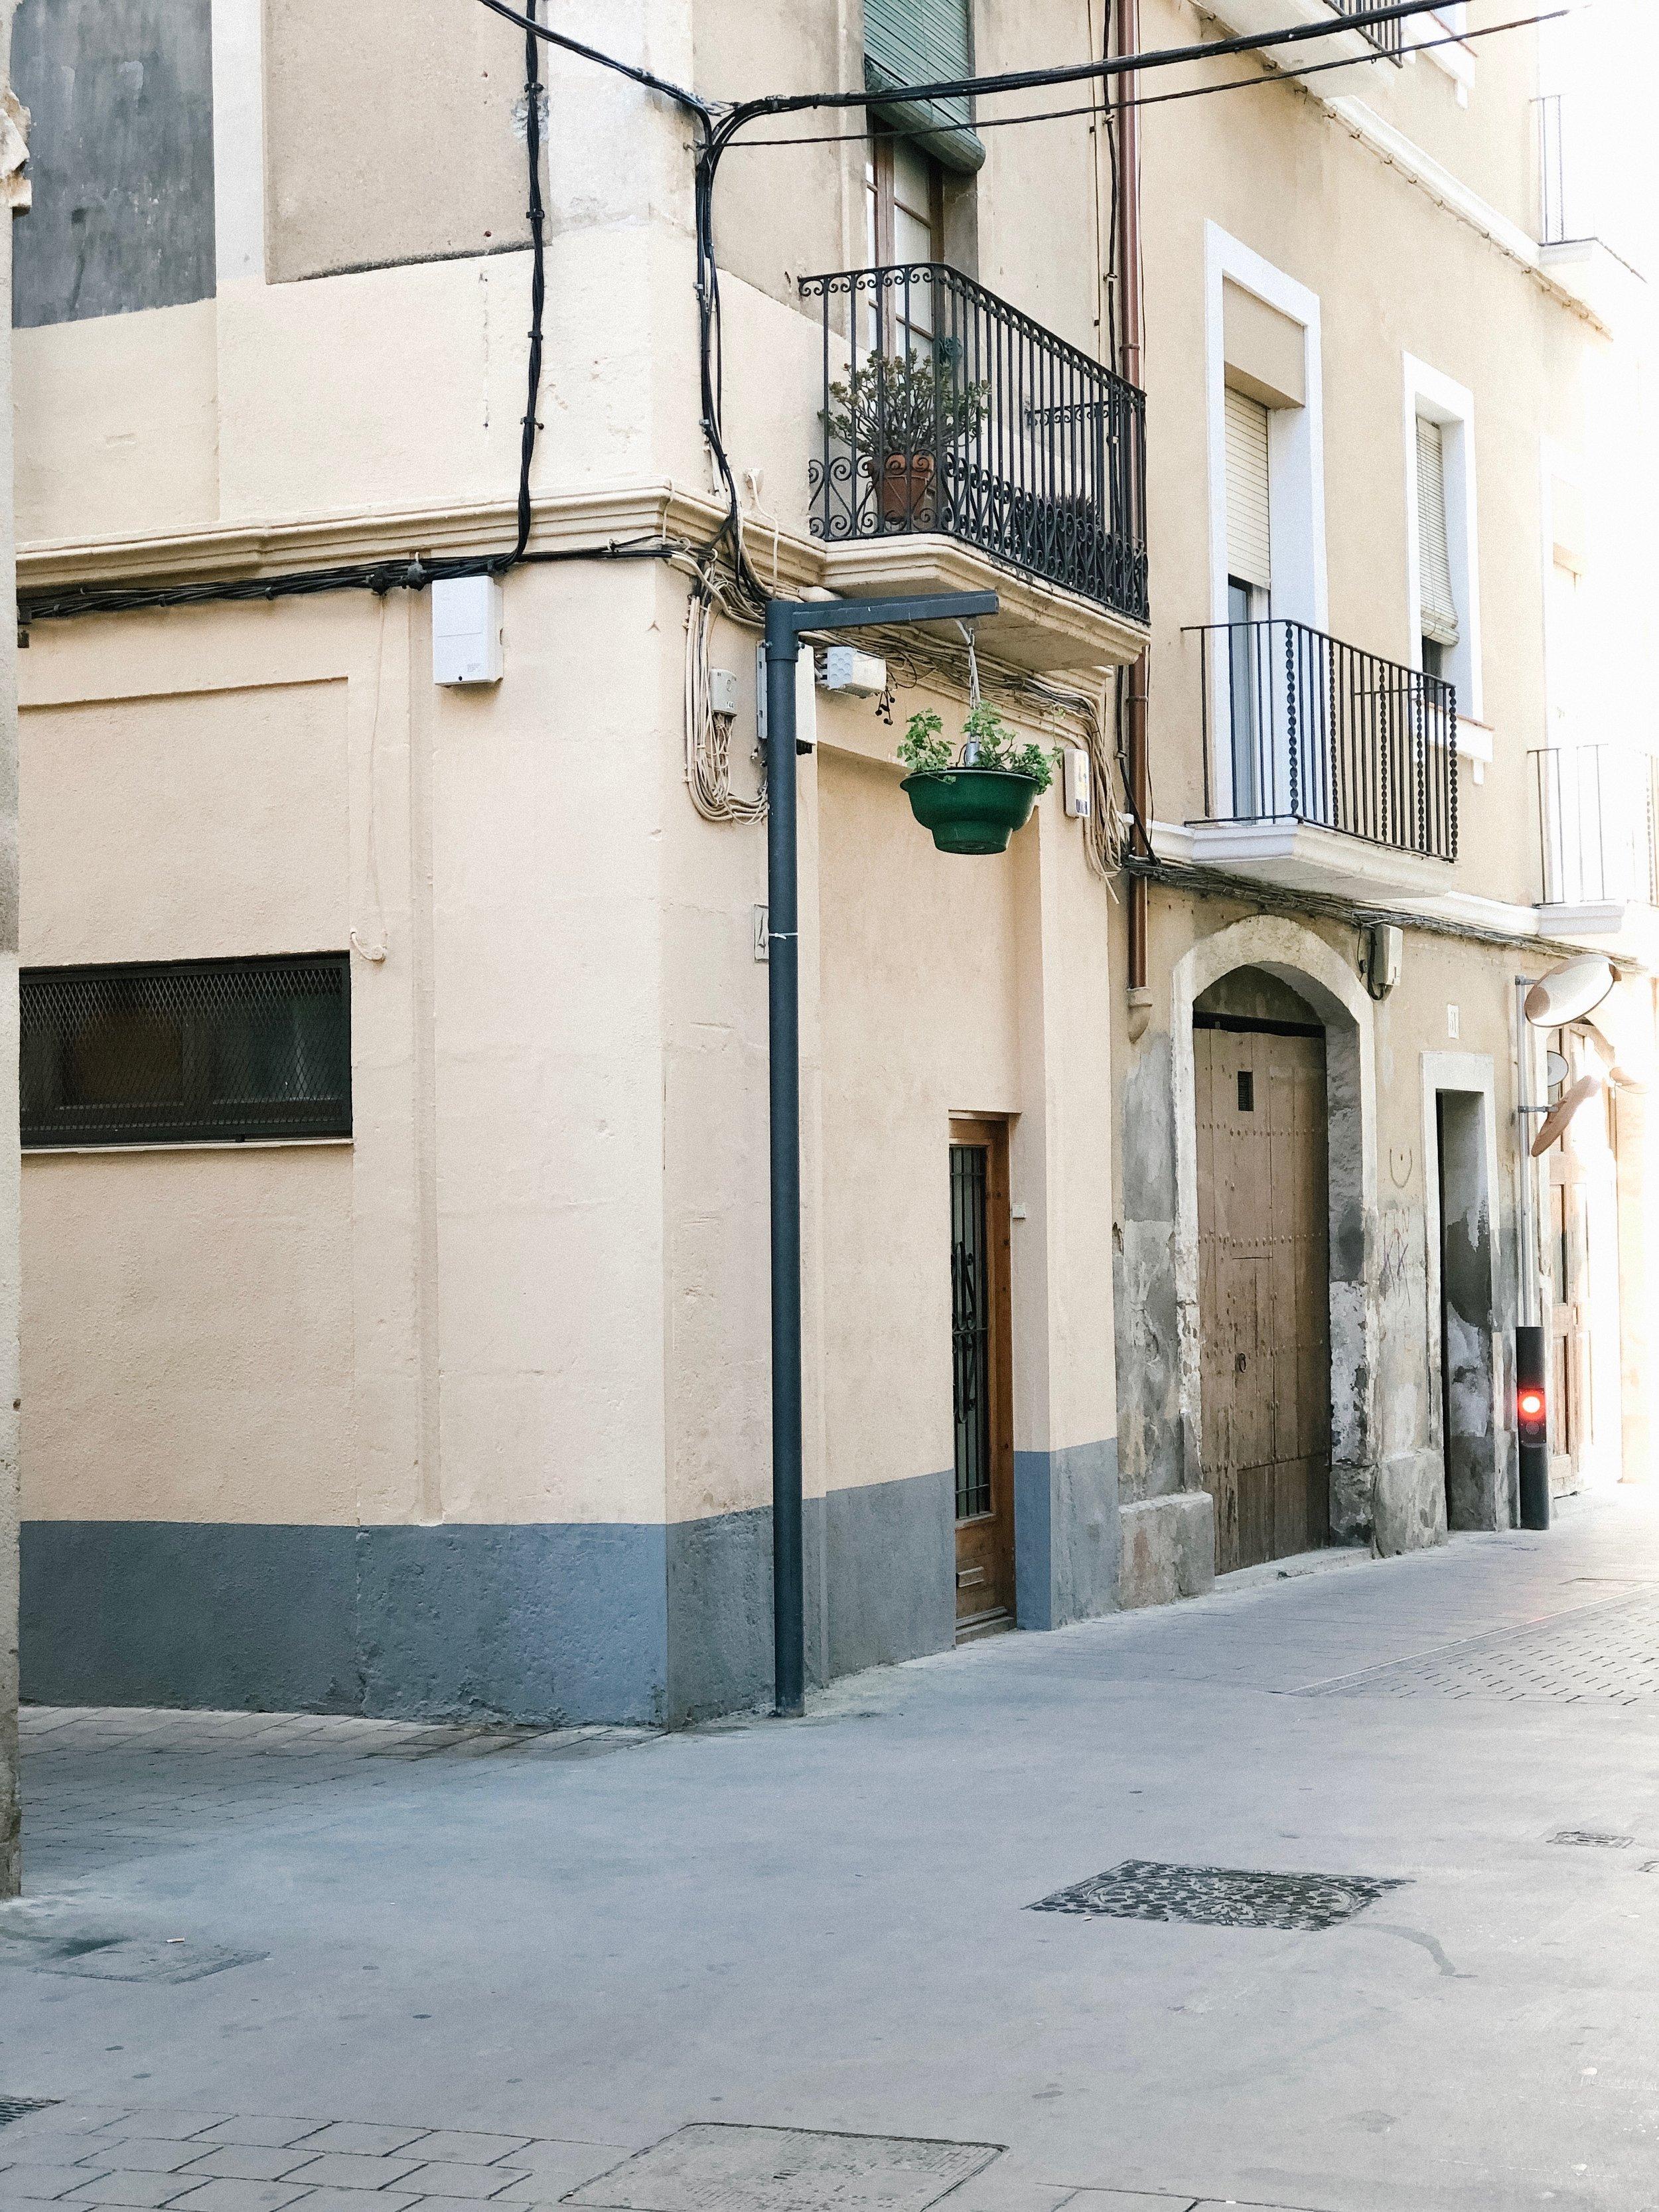 barcelona_honeymoon_vilafranca_del_penedes_1.jpg